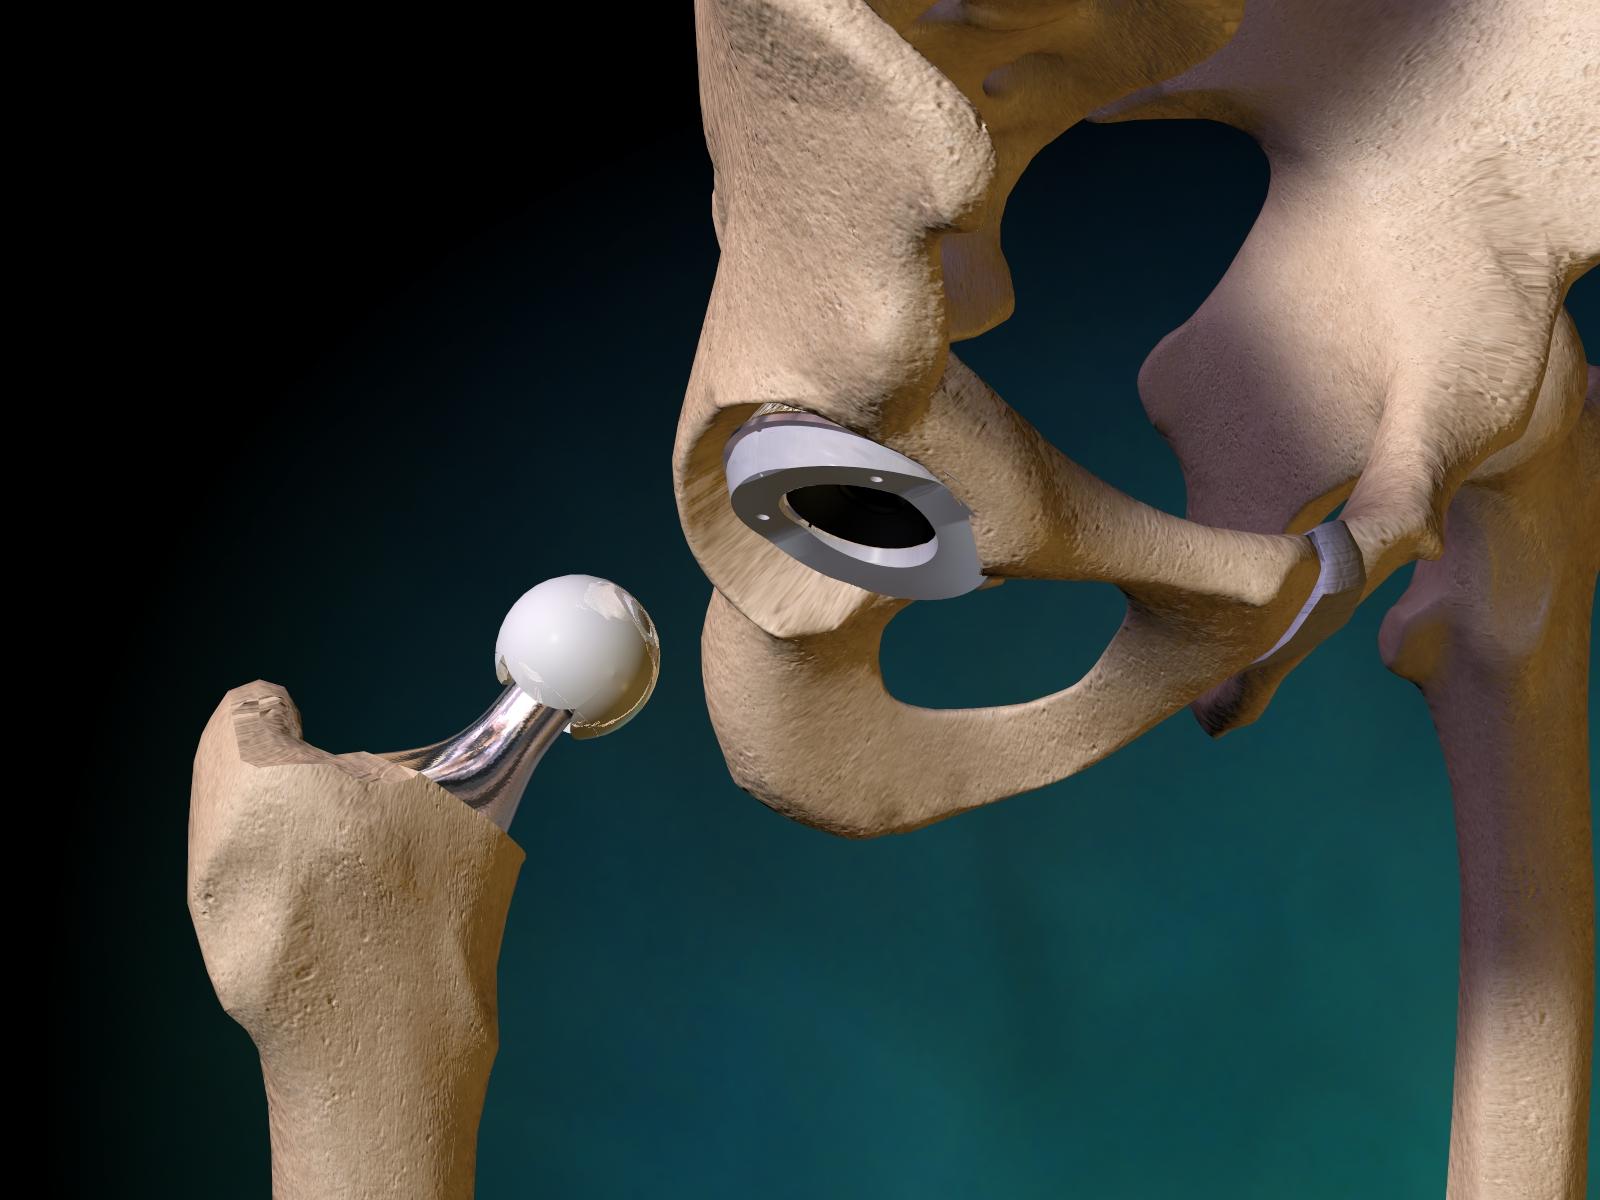 эндопротезирование тазобедренного сустава chjr rcgkefnfwbb